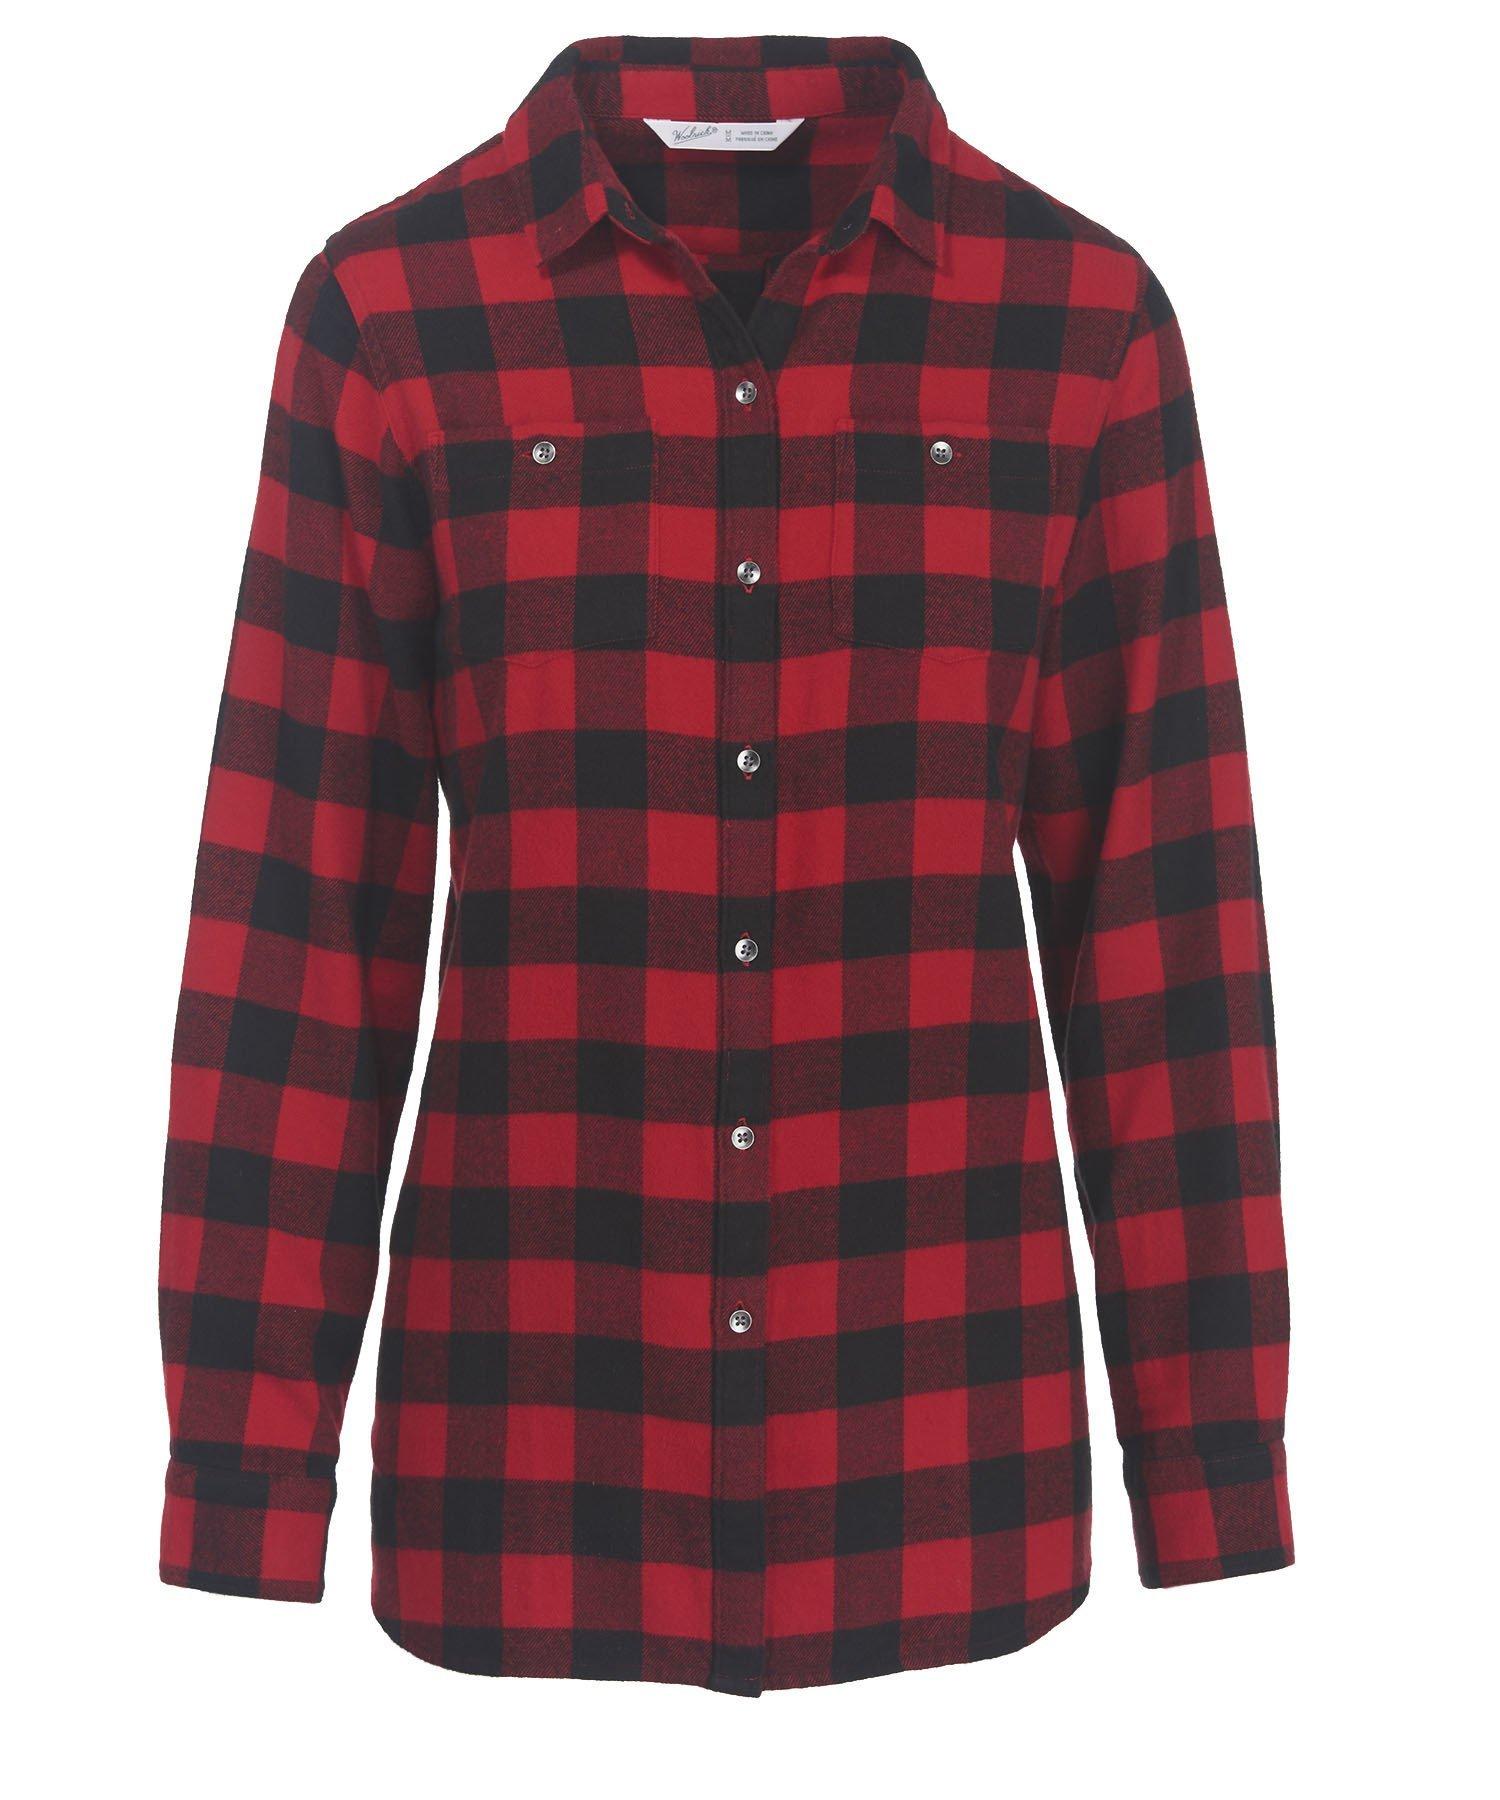 Woolrich Women's Pemberton Boyfriend Flannel Shirt, old red check, M